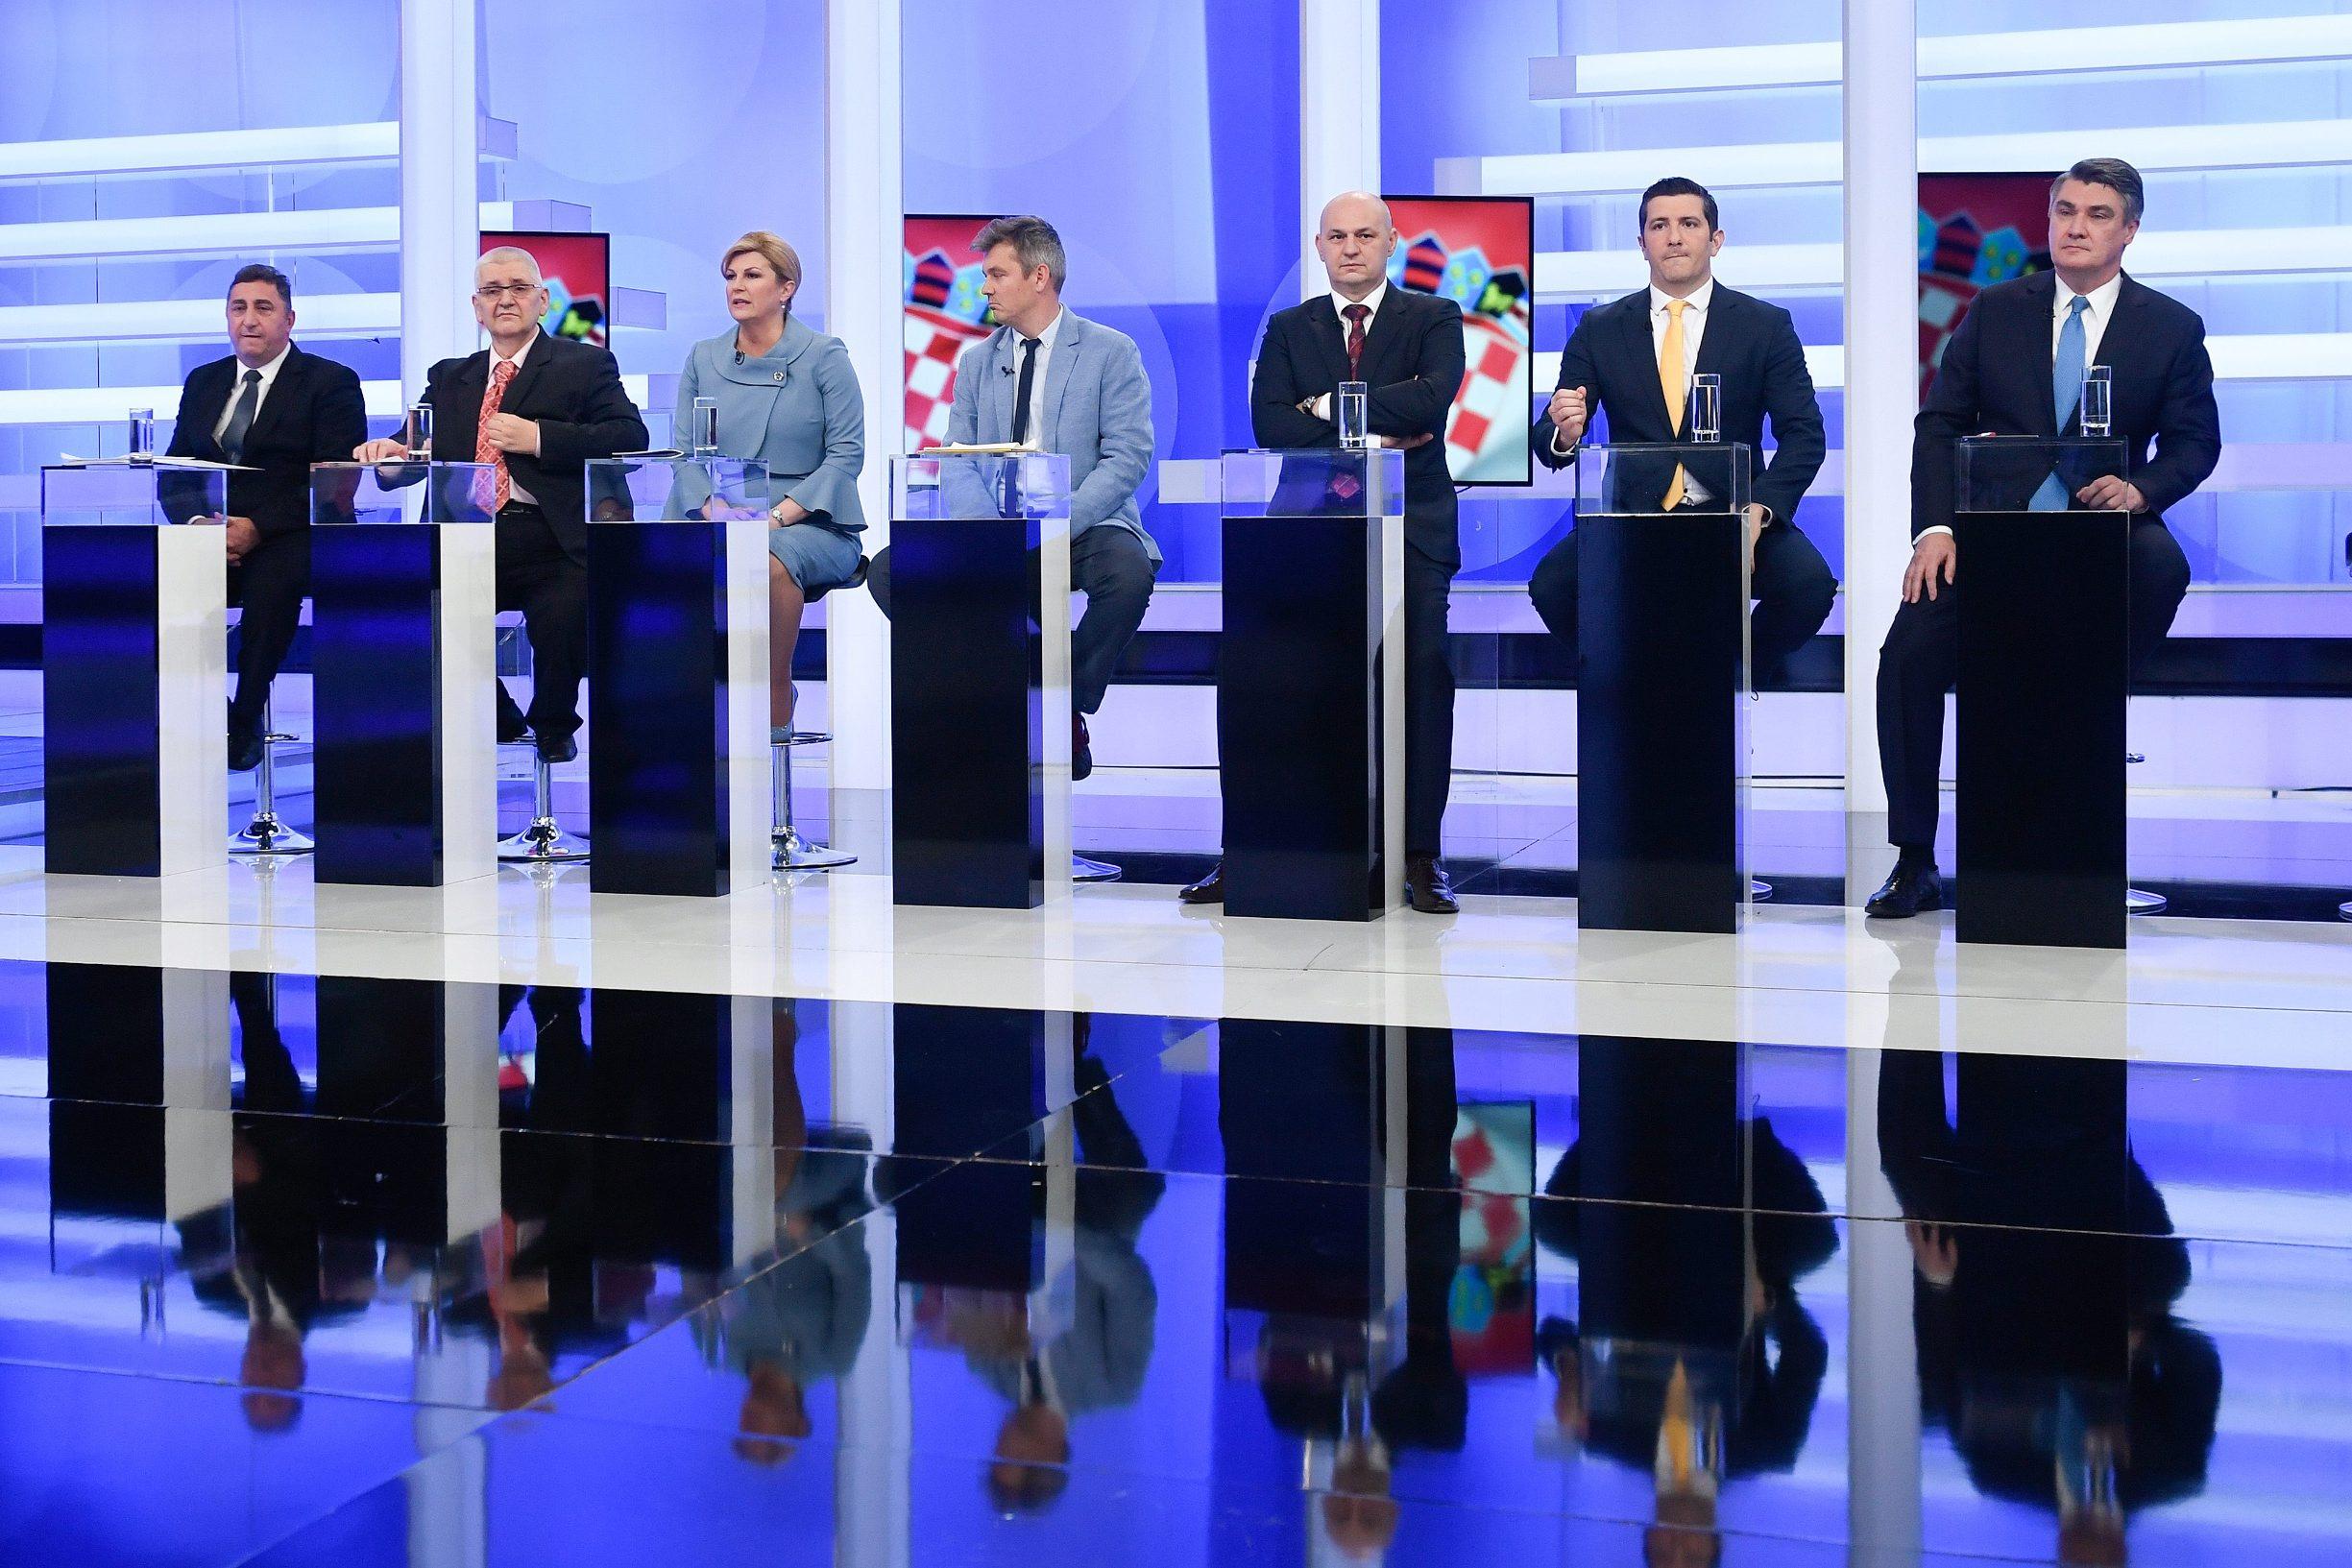 11 candidates; Nedjeljko Babić, Anto Đapić, Kolinda Grabar-Kitarović, Dario Juričan 'Milan Bandić', Mislav Kolakušić, Dejan Kovač and Zoran Milanović